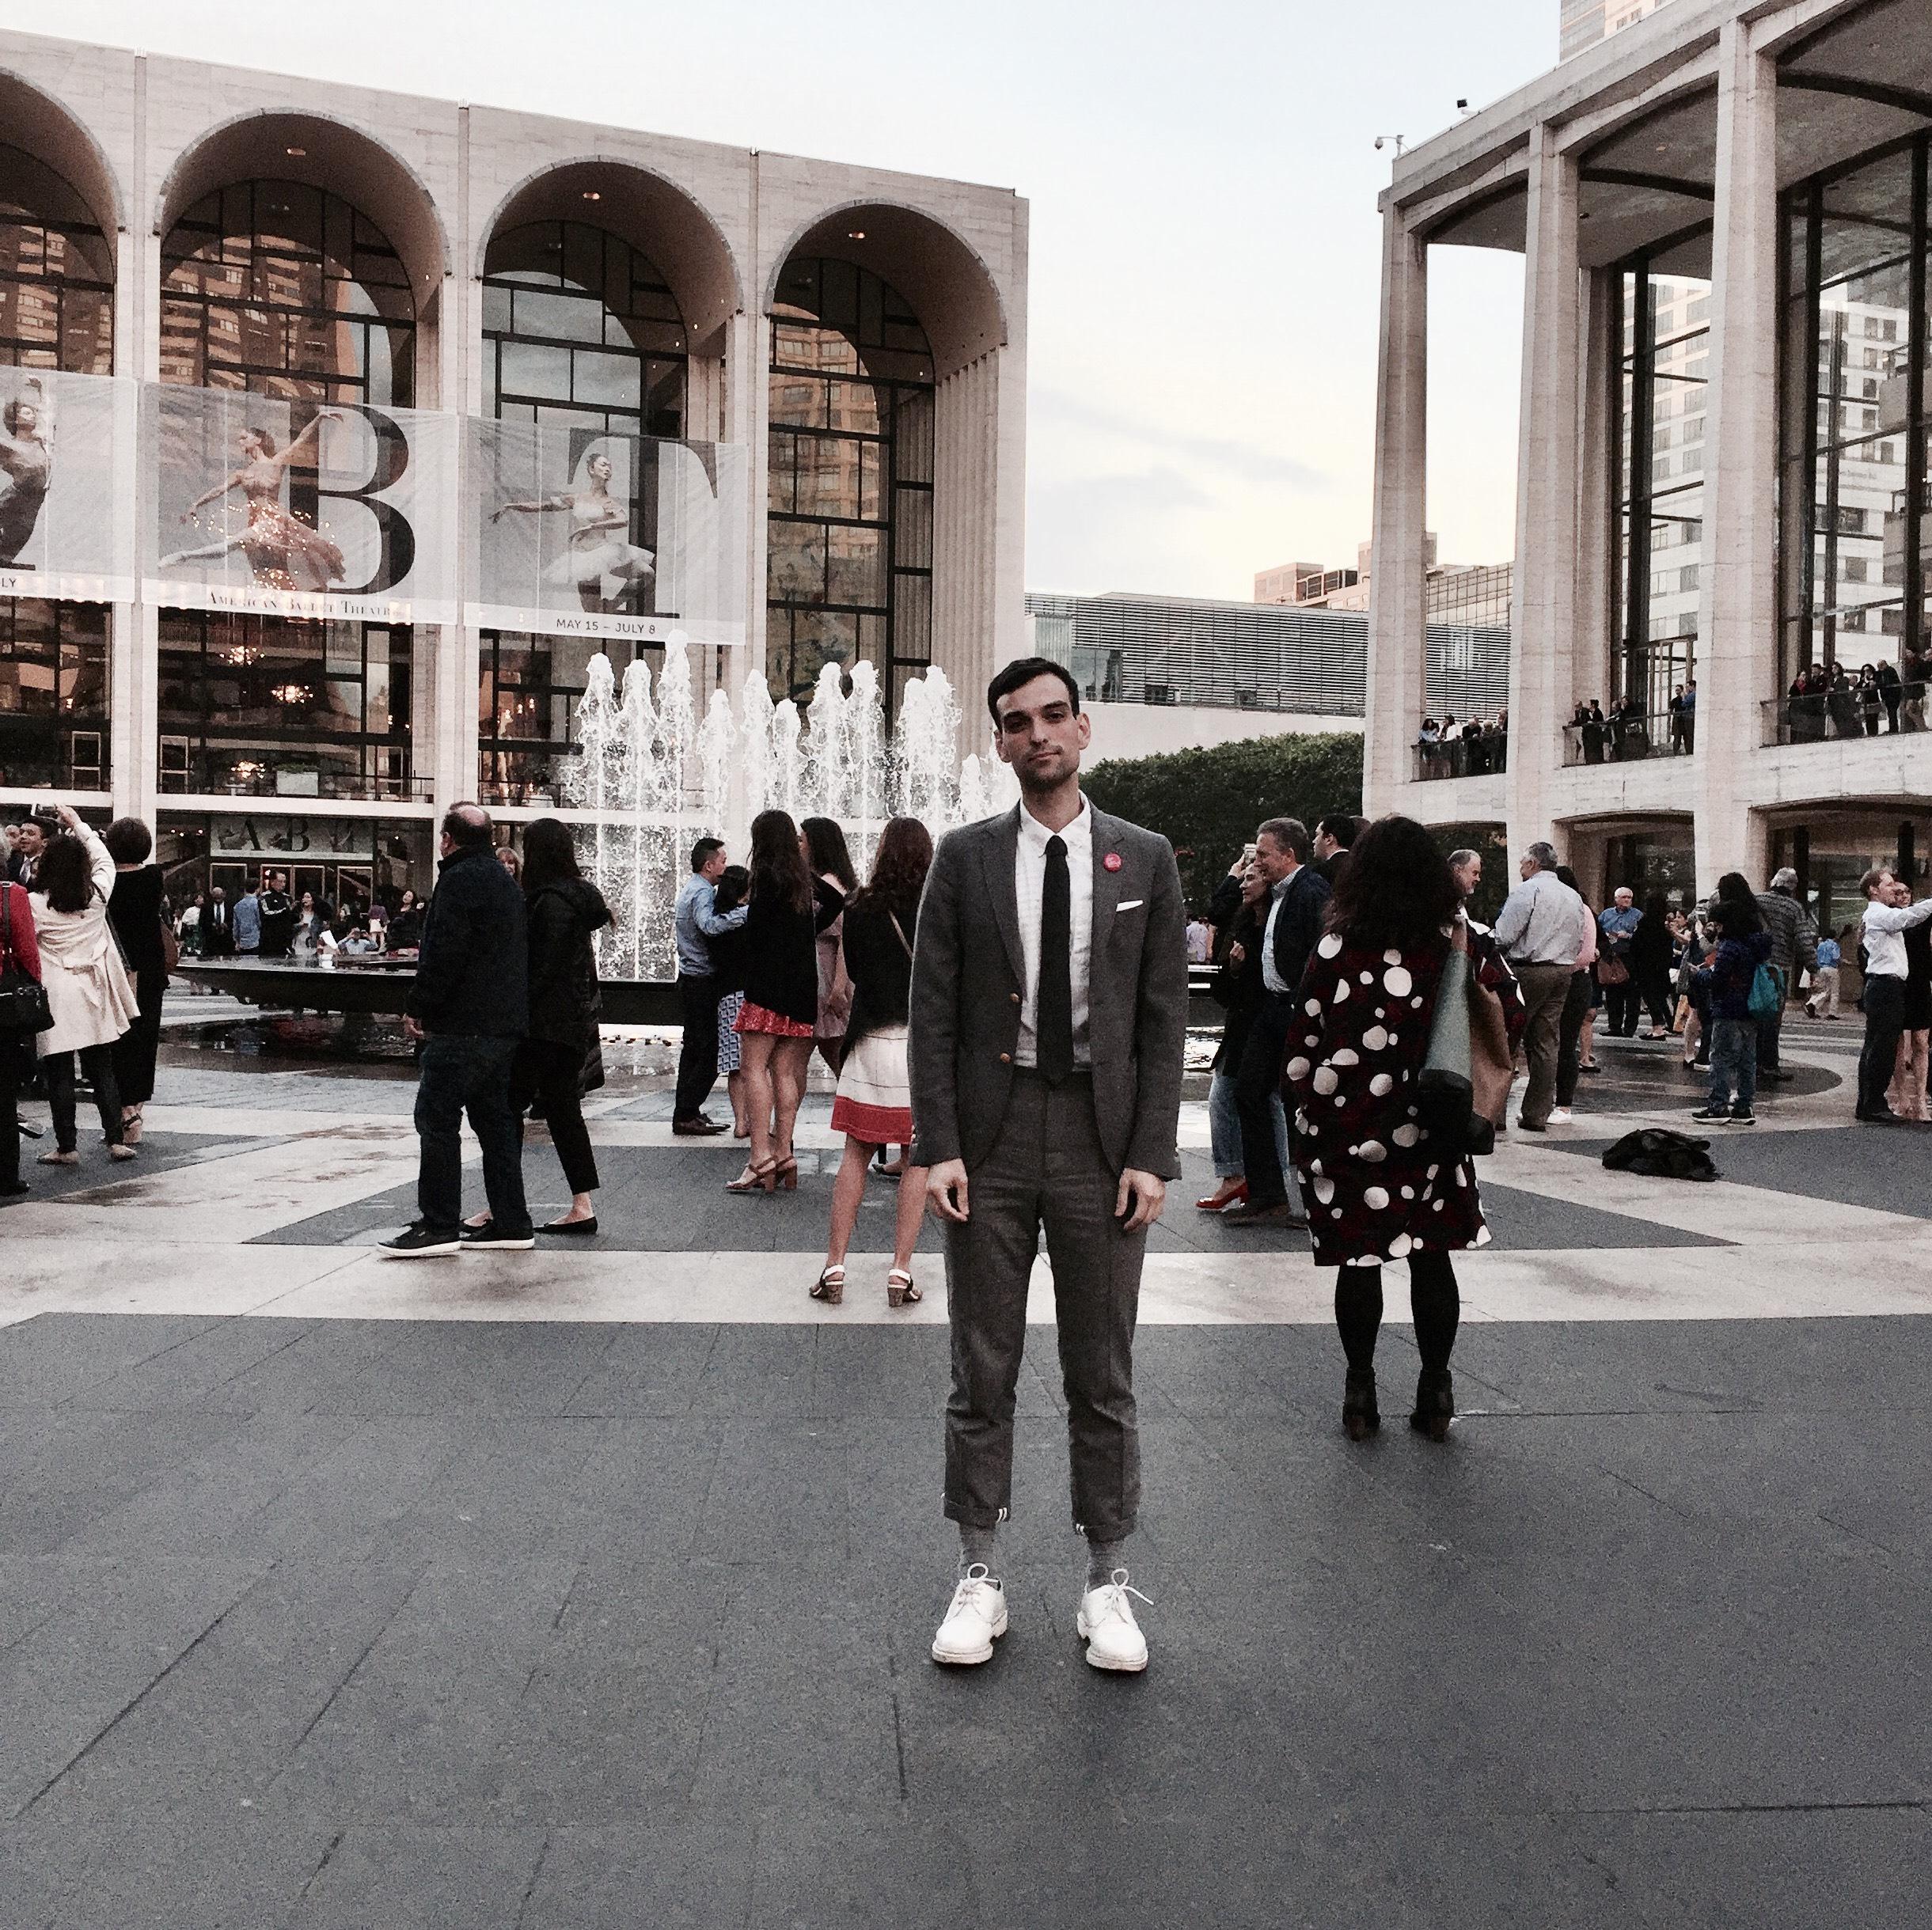 Ionut-Lincoln-Center.JPG